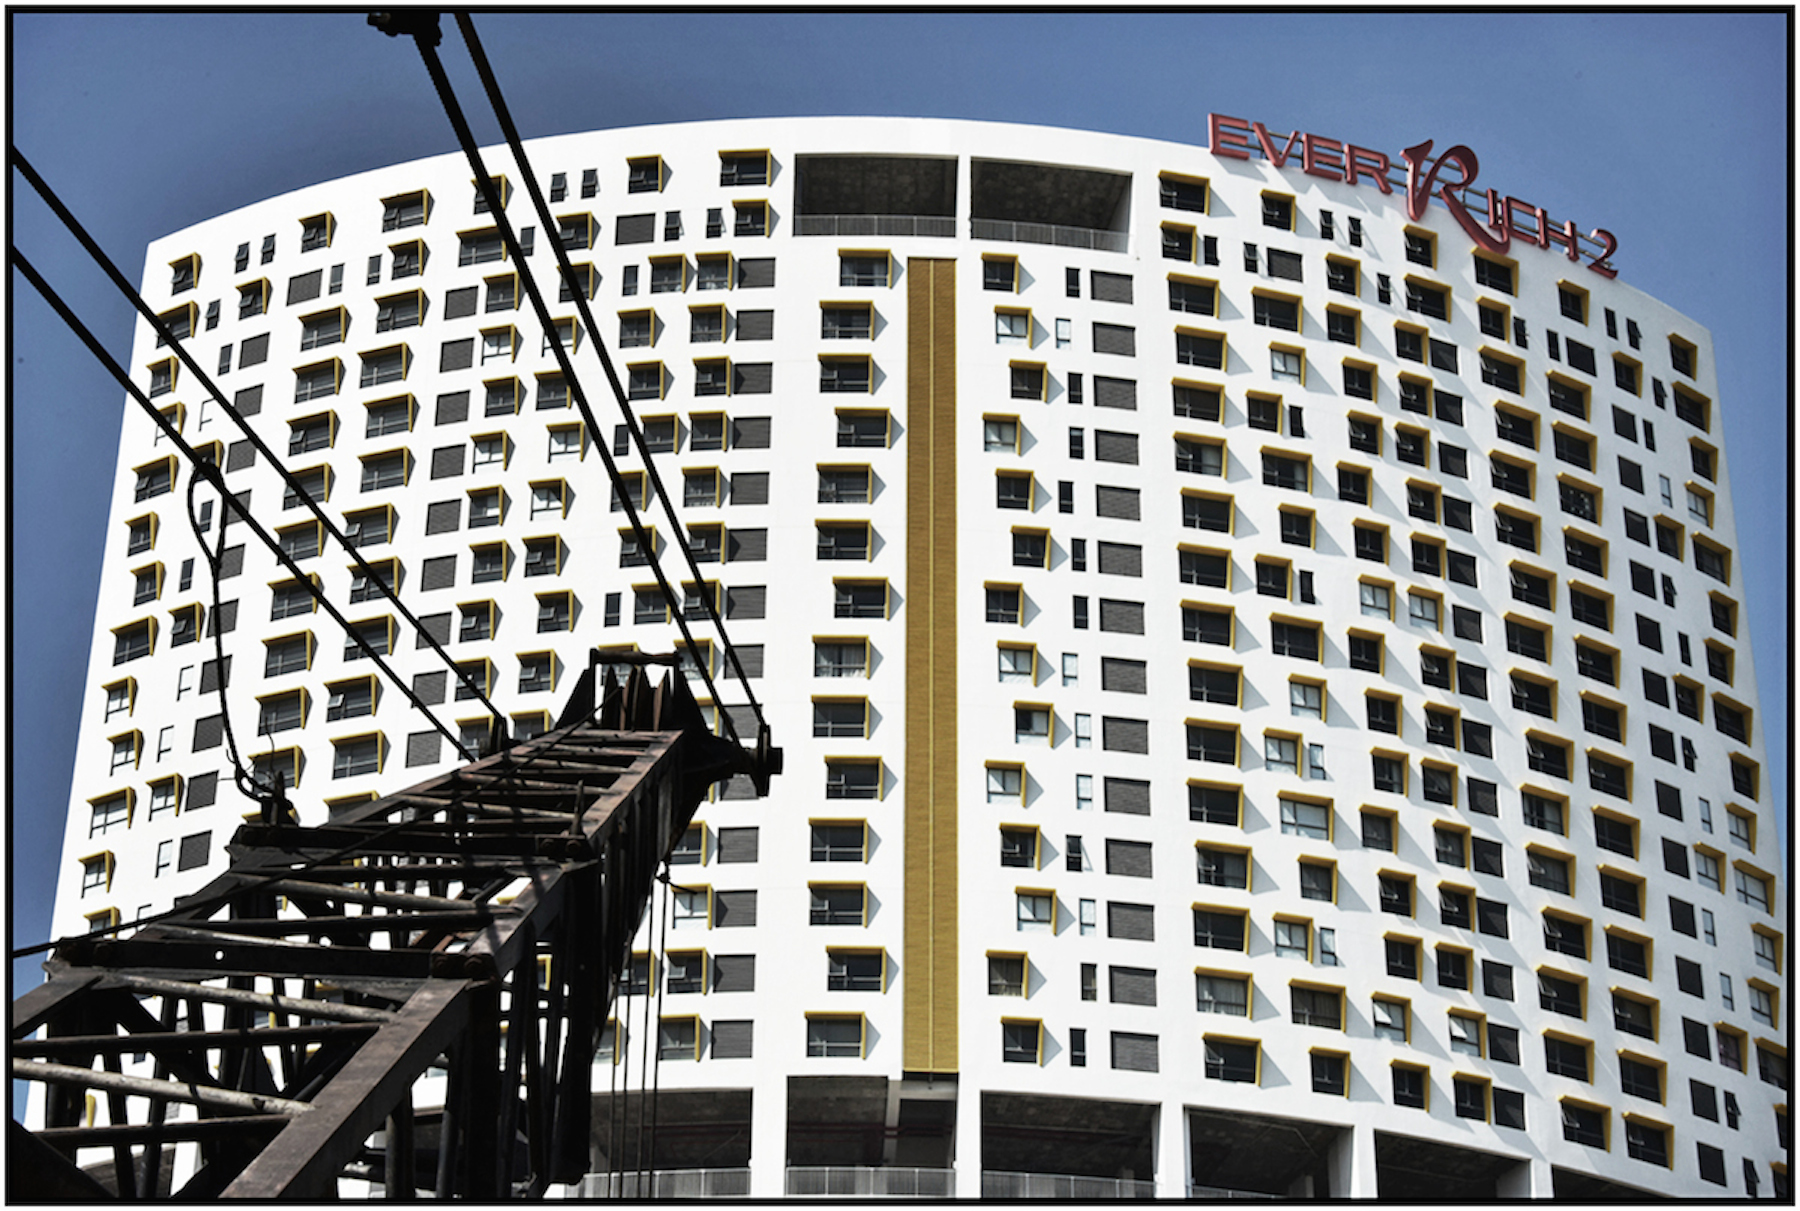 """EverRich 2"", luxury condo development under construction, Saigon/HCMC, Dec. 2015. #5347"